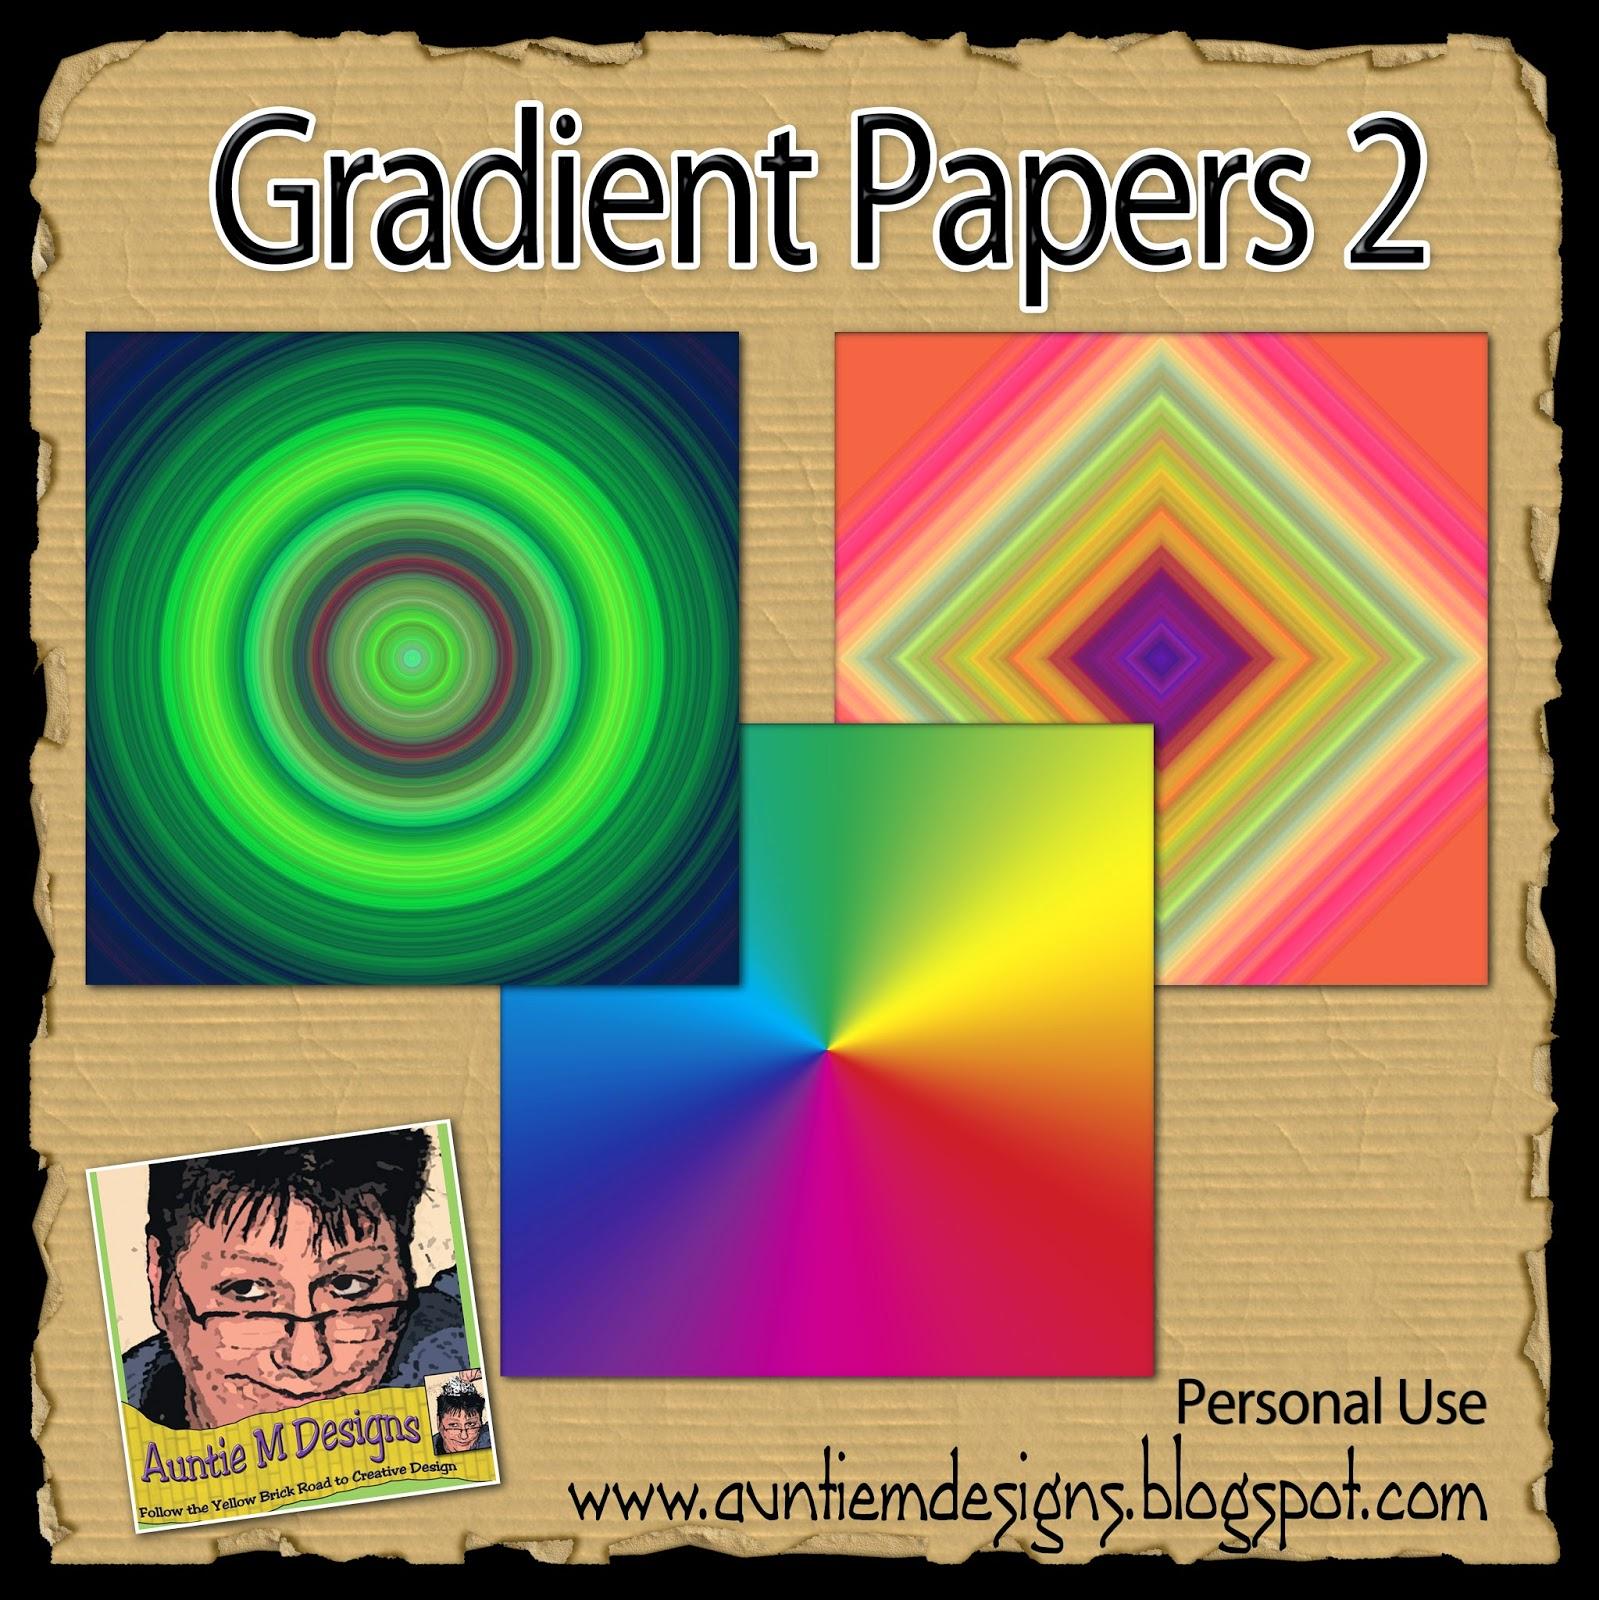 http://3.bp.blogspot.com/-SR-ZxNb1QvA/U90B9-1OAYI/AAAAAAAAG7A/0Al1IzGnZHI/s1600/folder.jpg